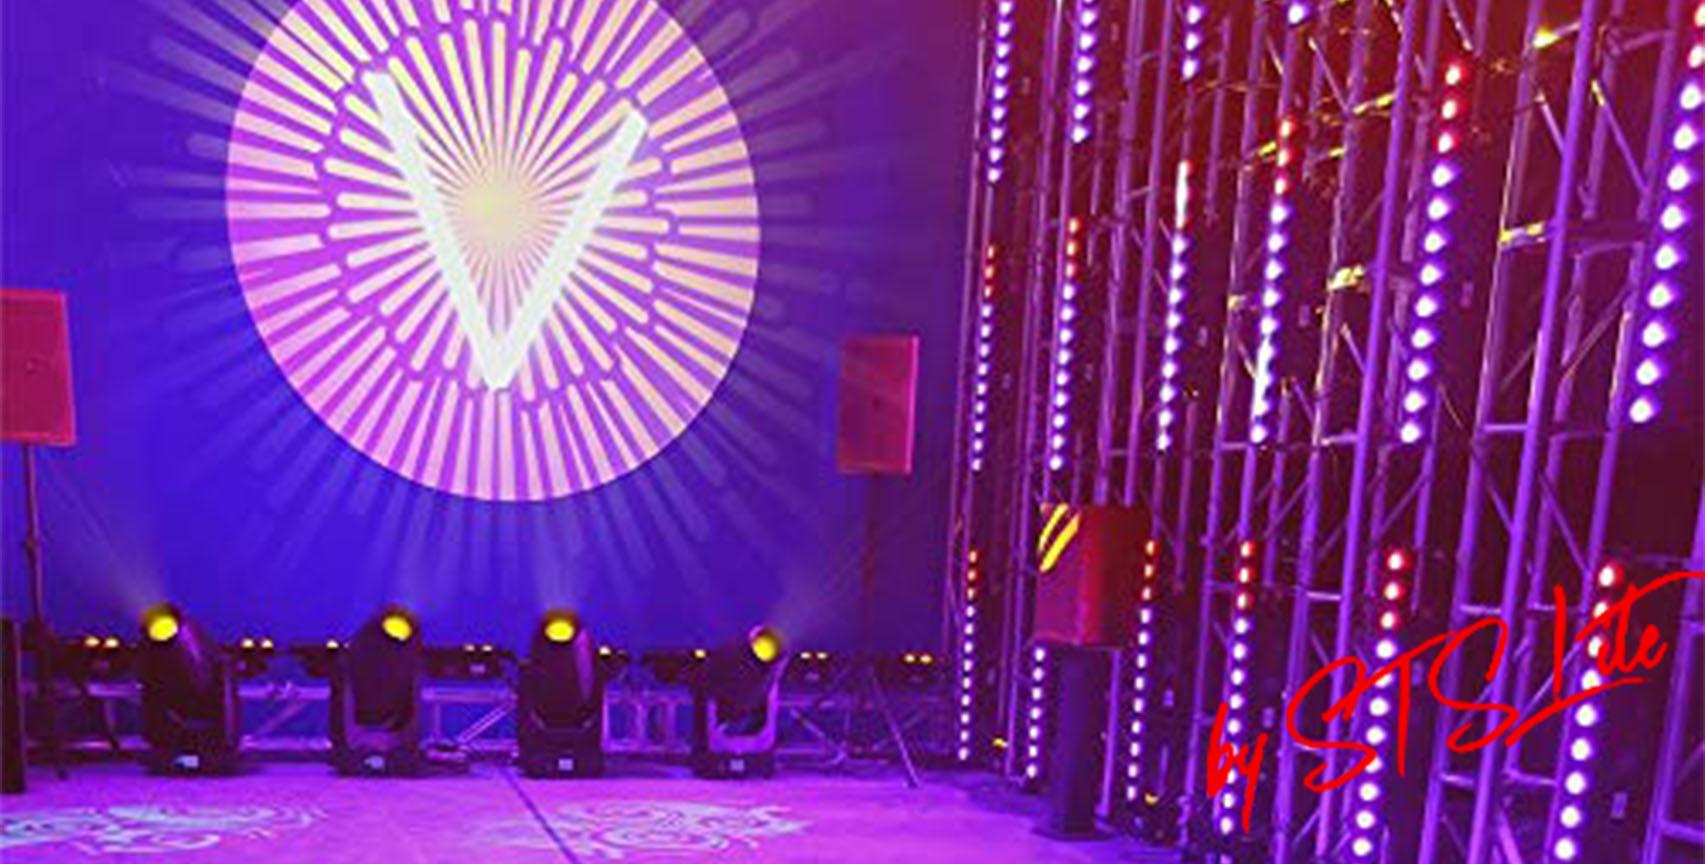 led stage lighting